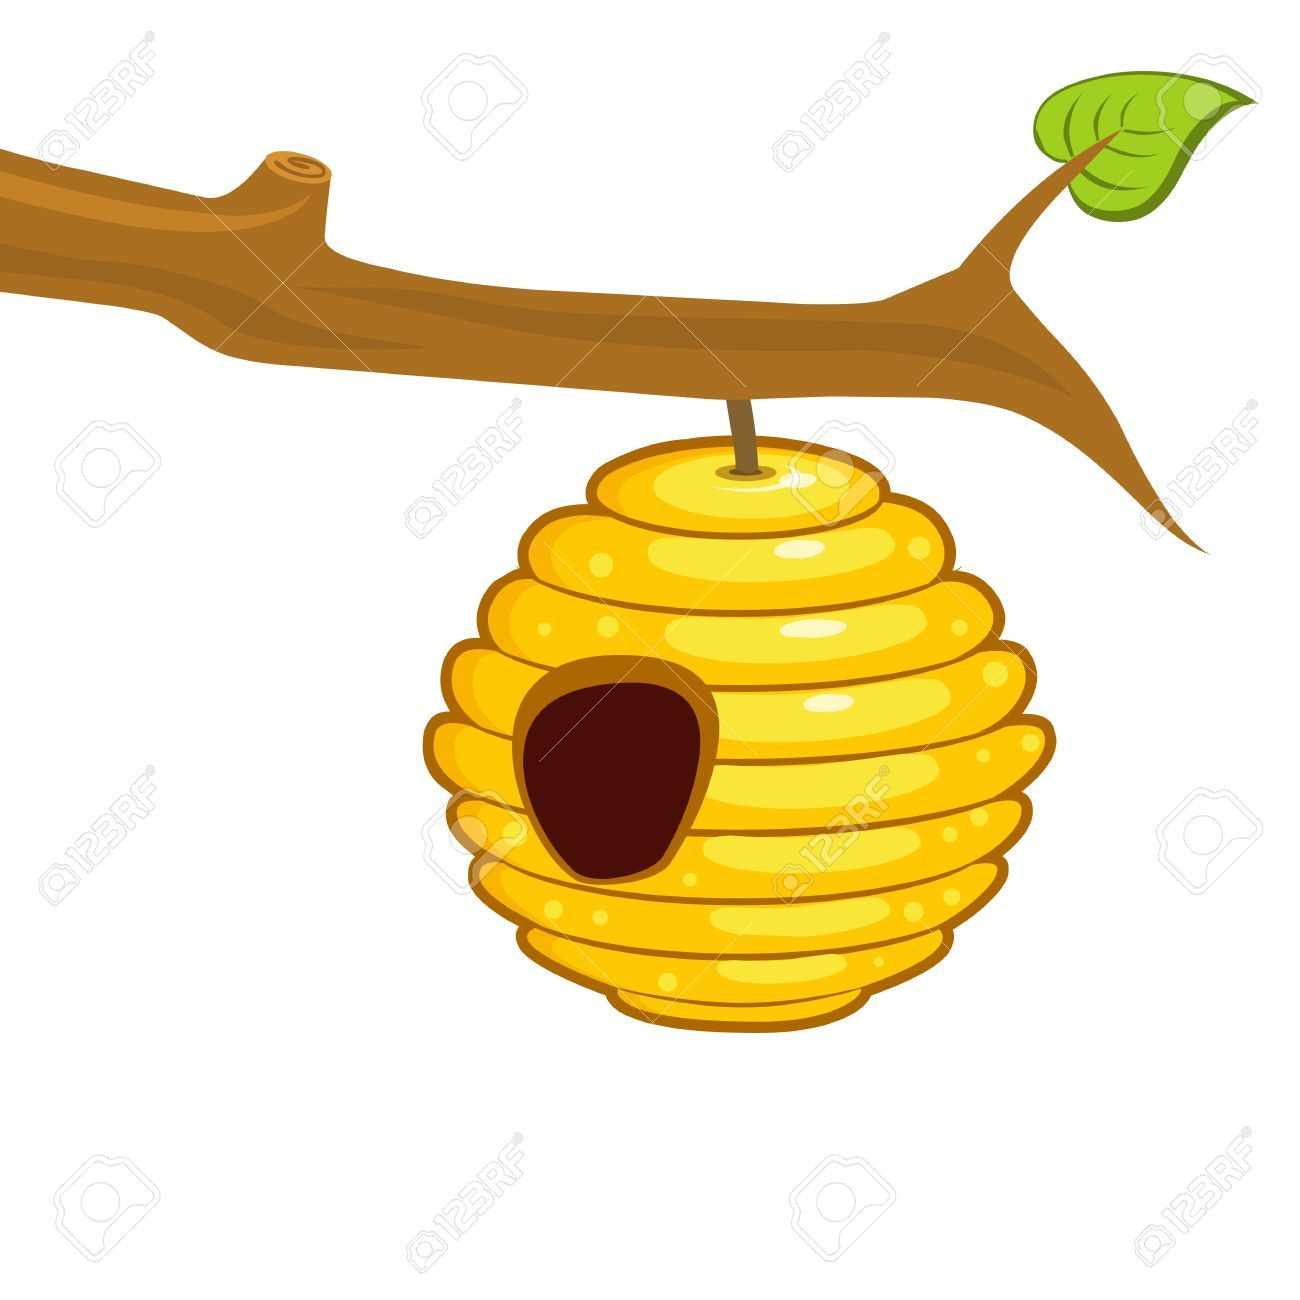 Bees nest clipart » Clipart Portal.